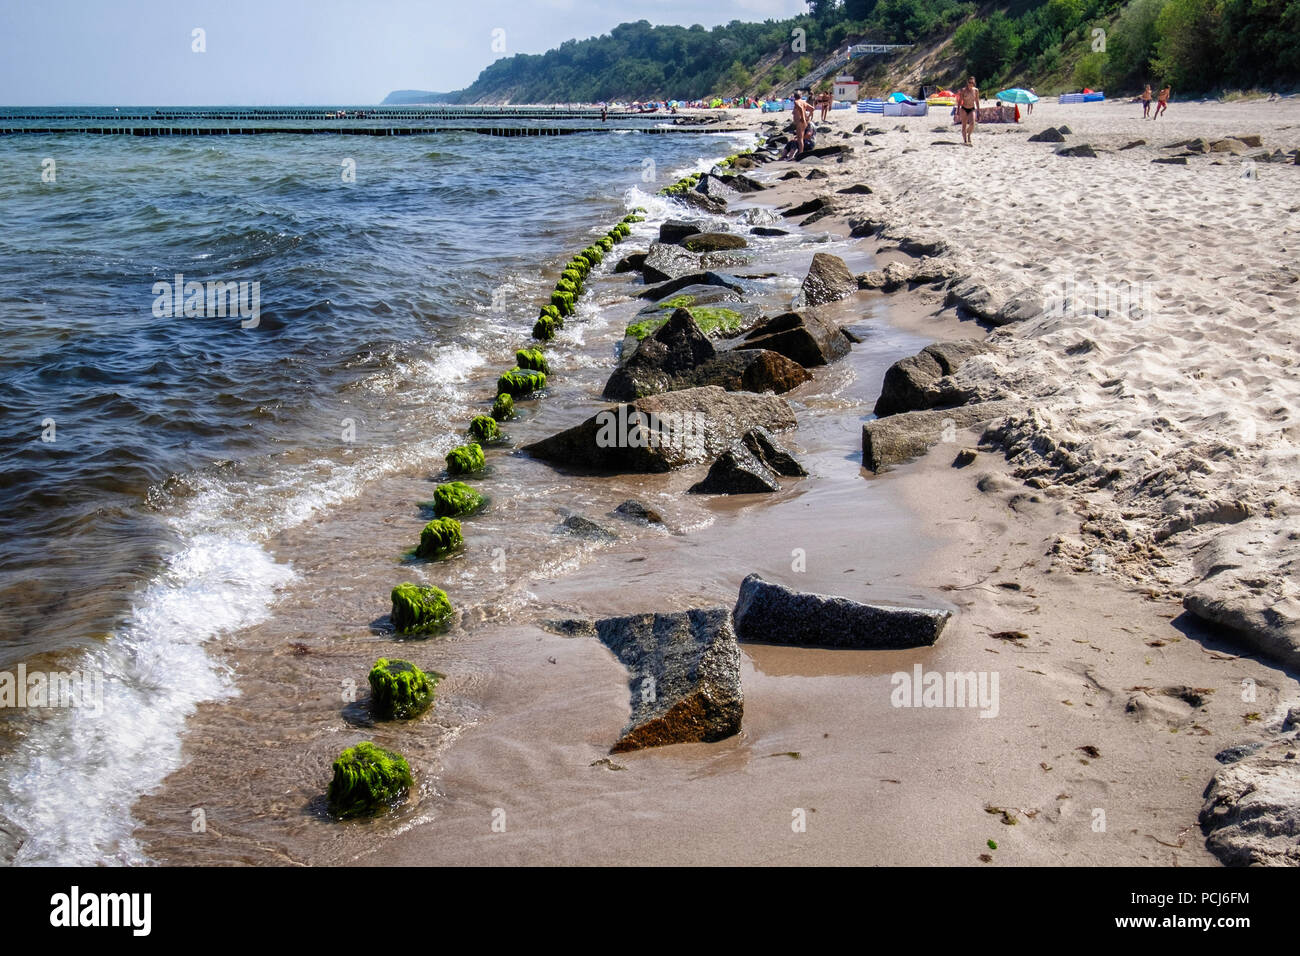 Deutschland Zempin, Stubbenfelde Strand. Küsten Badeort auf der Insel Usedom an der Ostsee. Felsen & Holz groyne verhindern Erosion der Sandstrand Stockbild